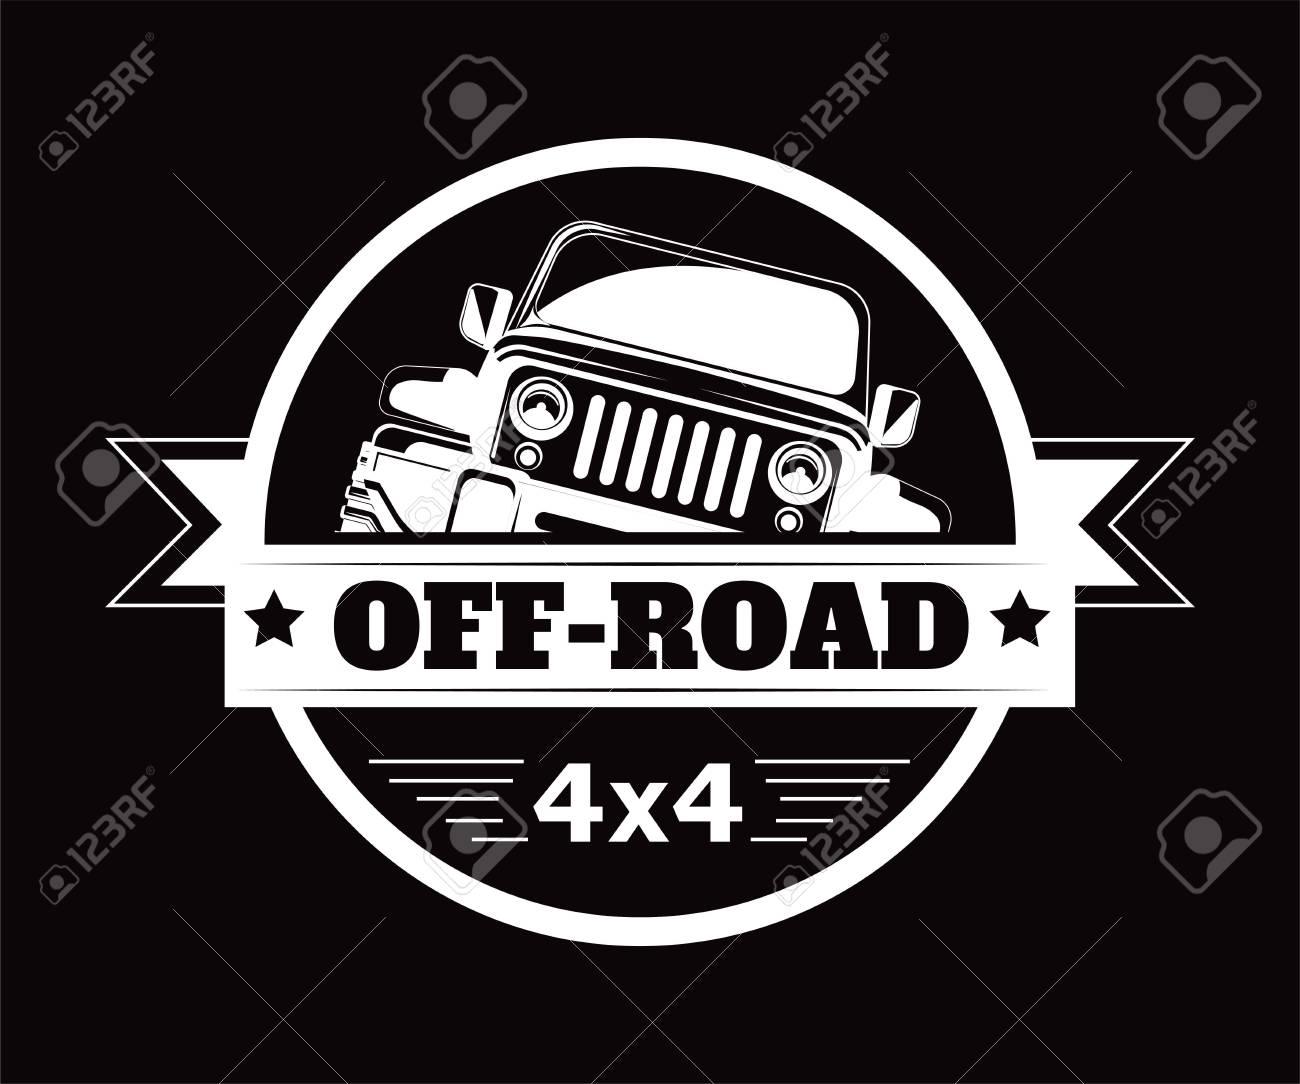 Off-road 4x4 extreme car adventure club vector icon - 102927681